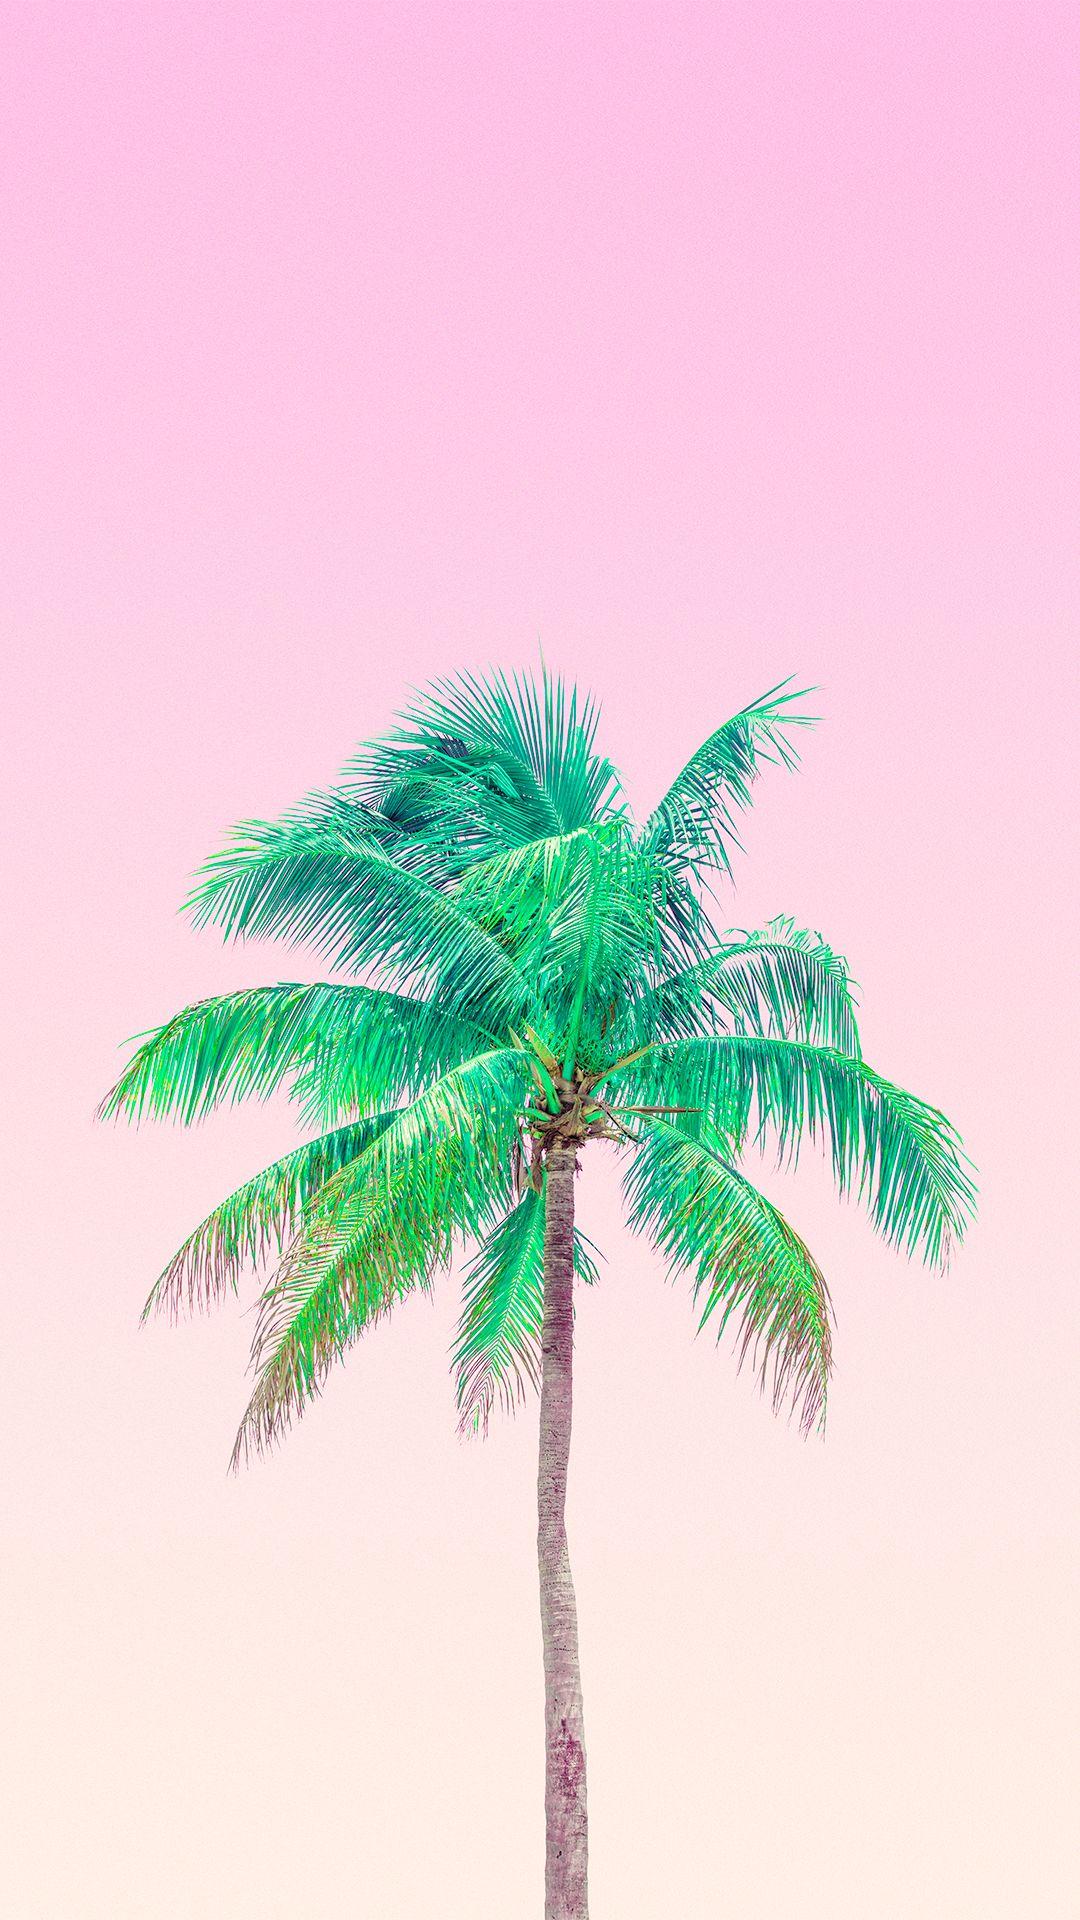 Palm Tree Wallpaper Tree Wallpaper Iphone Summer Wallpaper Tree Wallpaper